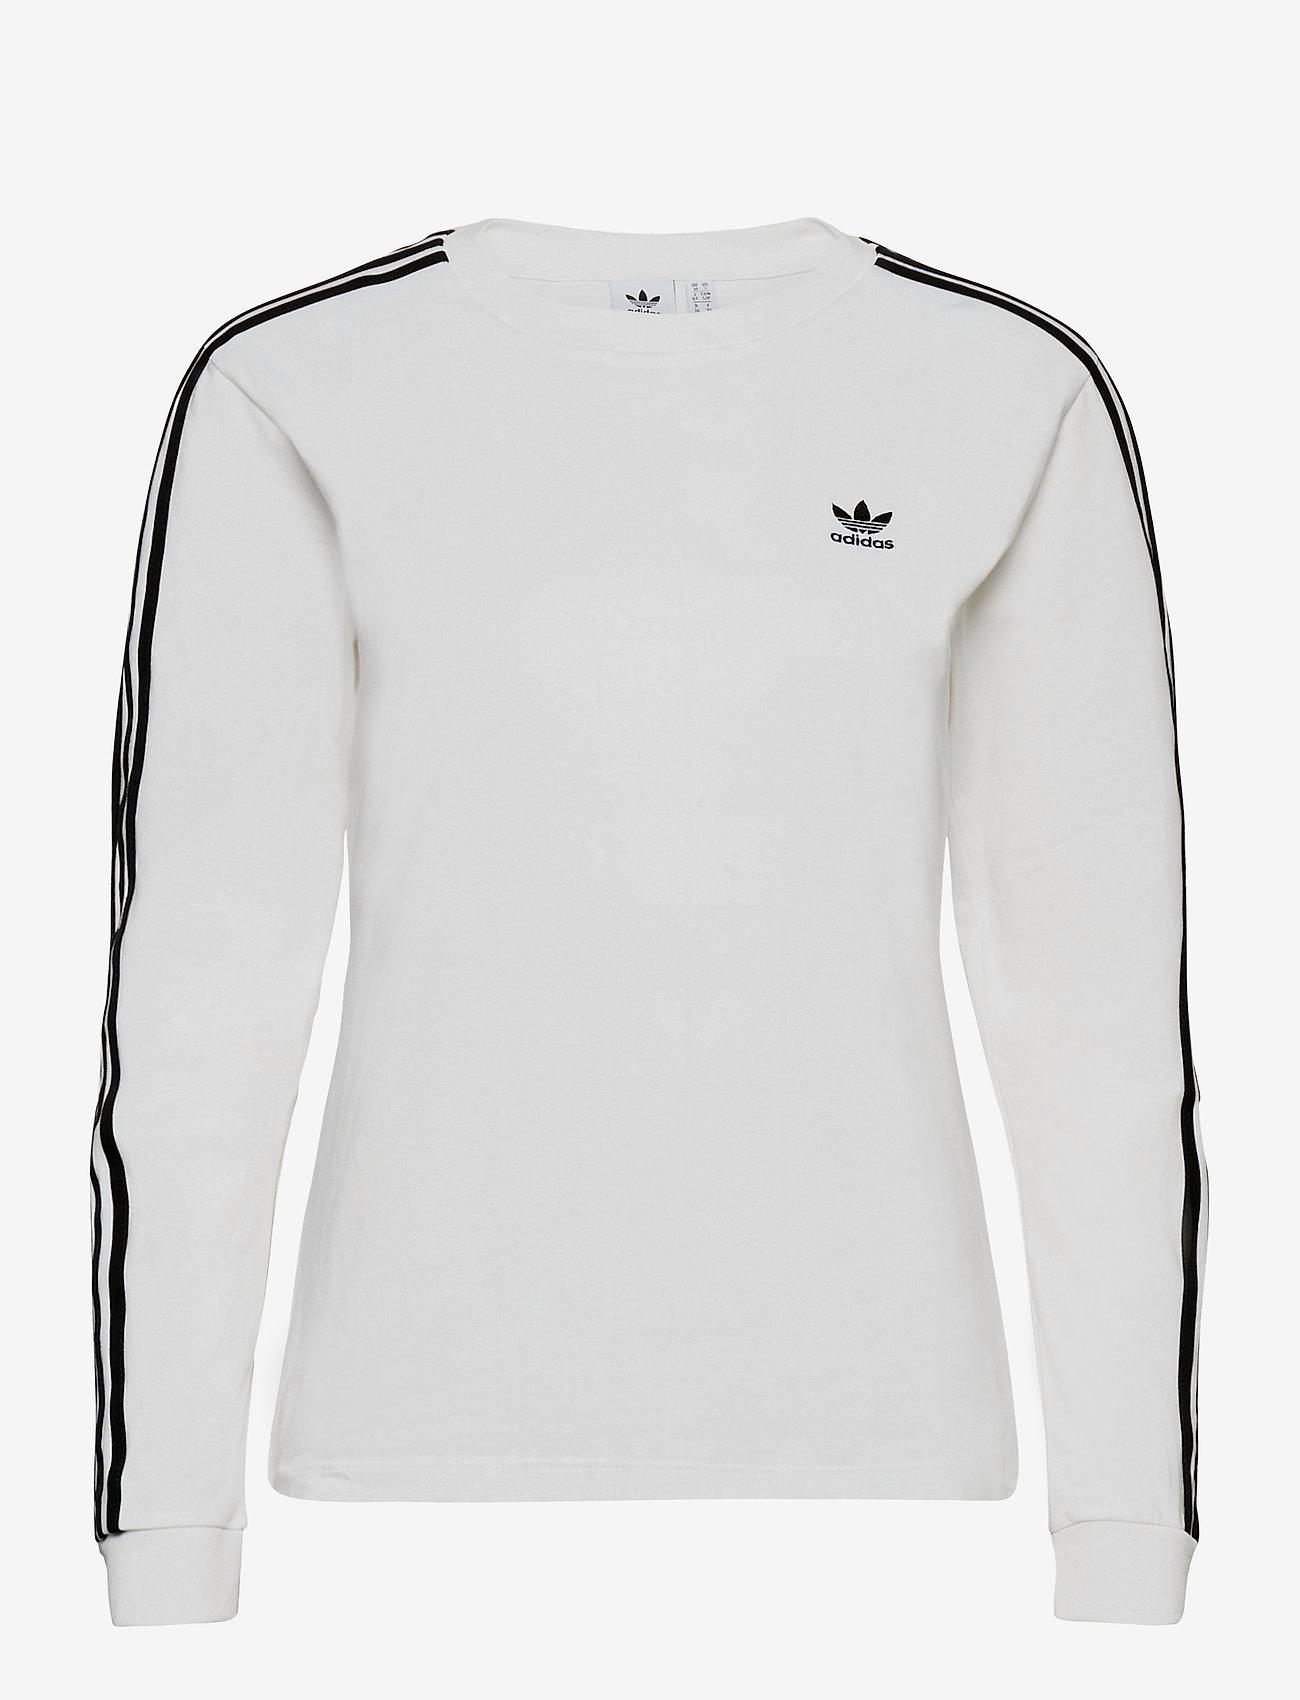 adidas Originals - Adicolor Classics Long Sleeve T-Shirt W - topjes met lange mouwen - white/black - 0